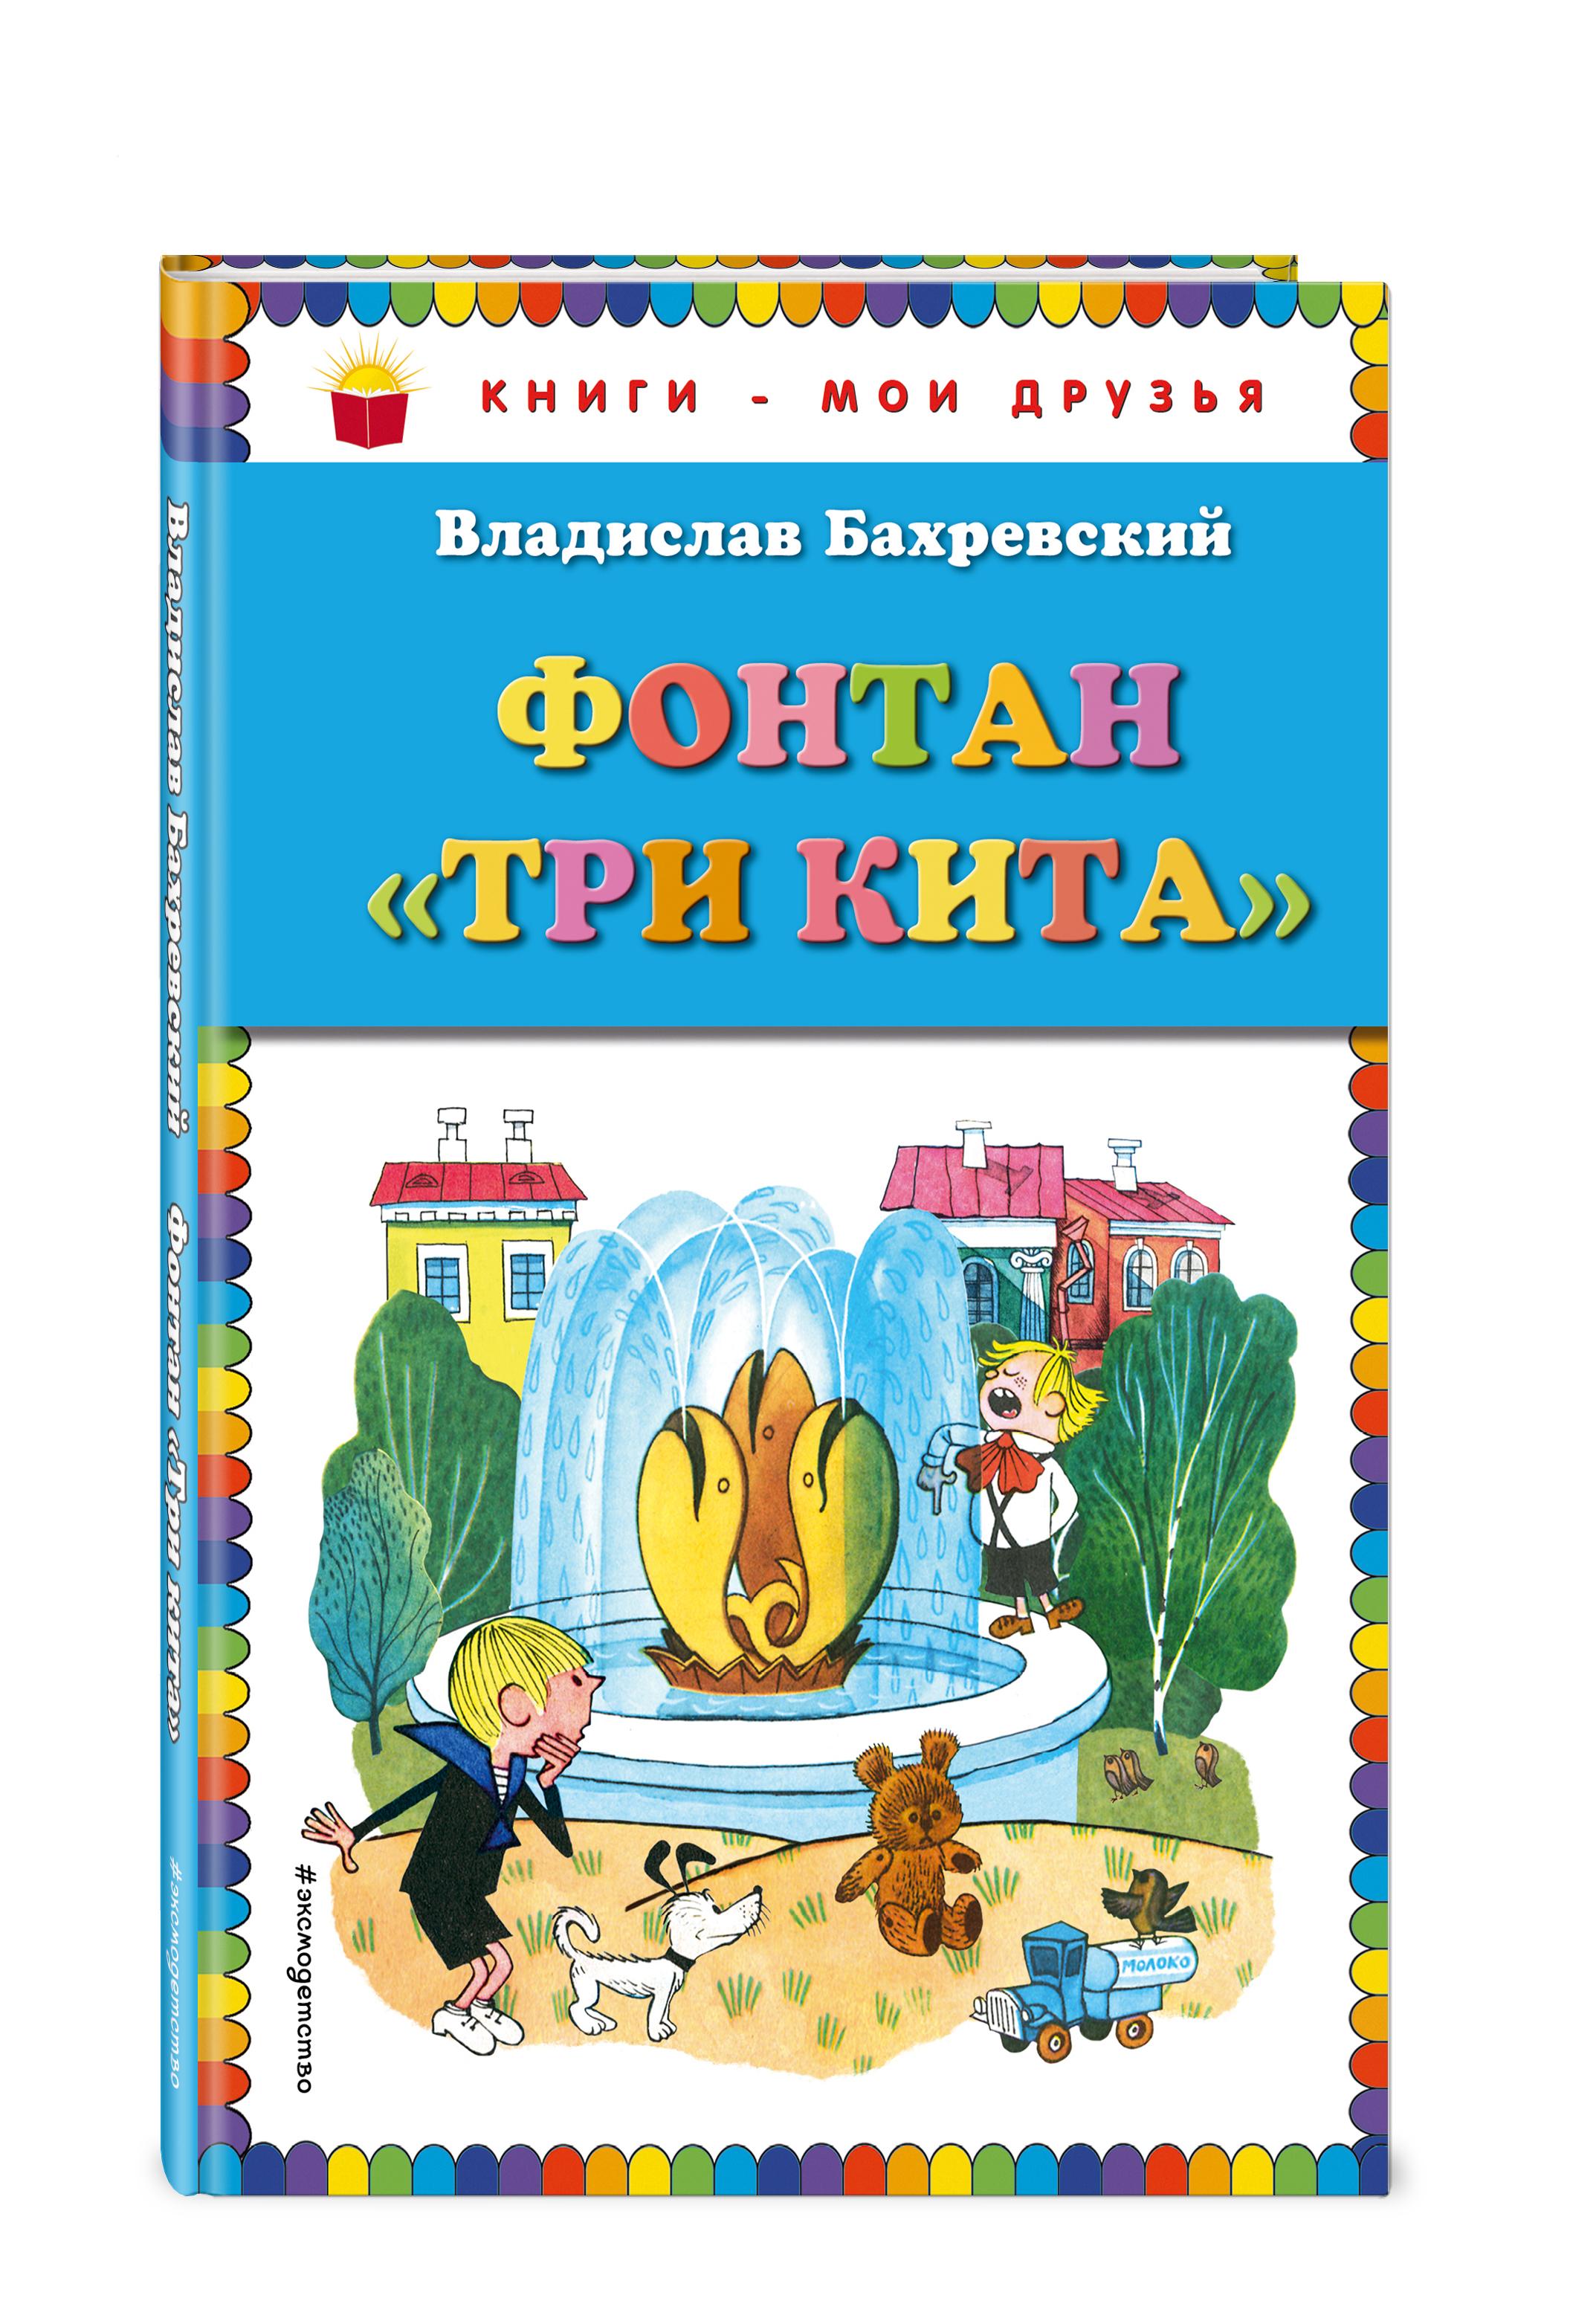 Владислав Бахревский Фонтан Три кита (ил. В. Чижикова)